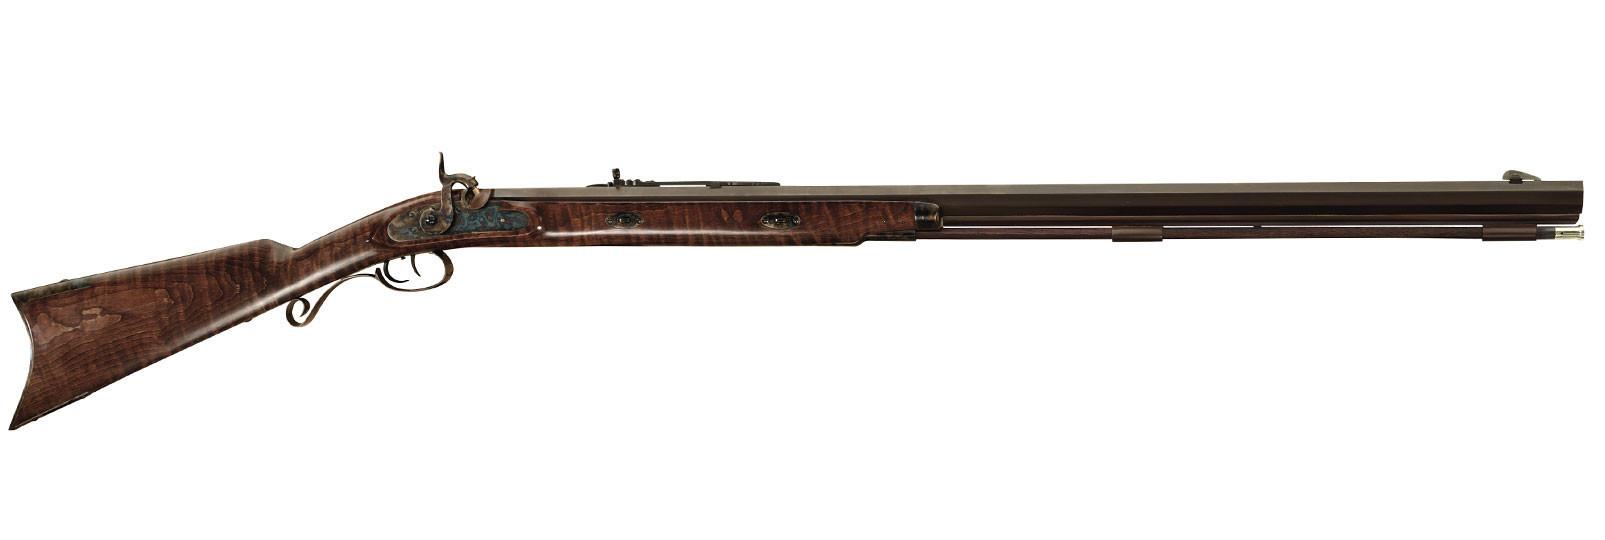 "Missouri River Hawken ""maple"" Rifle"